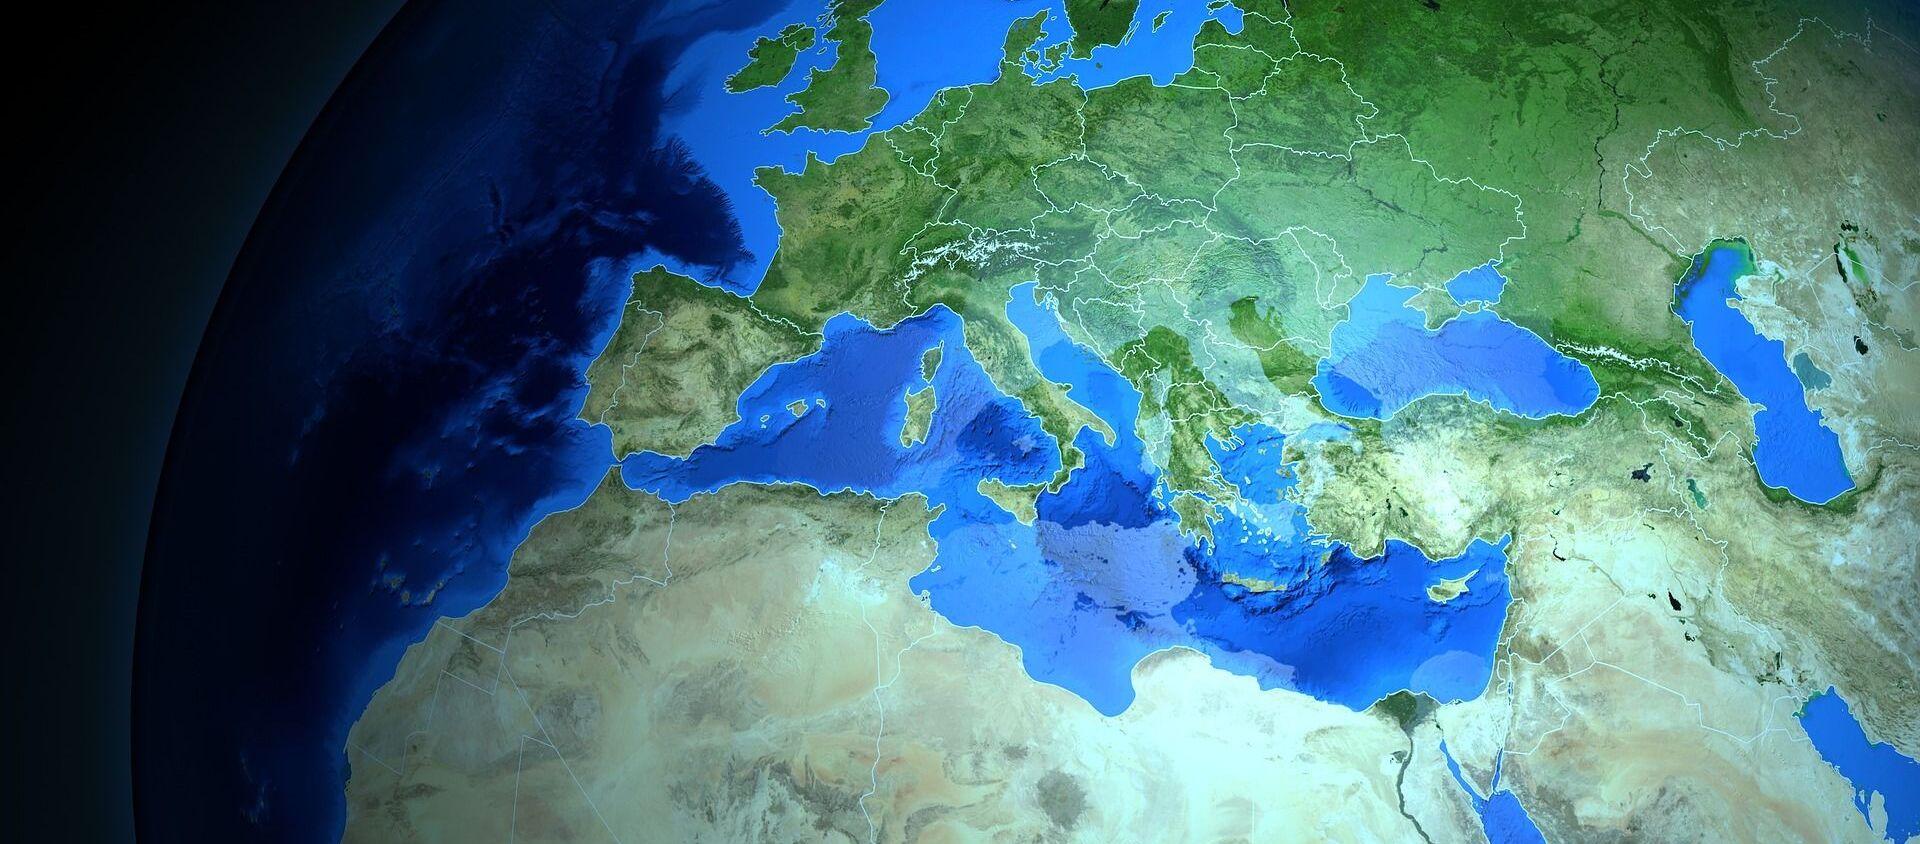 Mapa de Europa - Sputnik Mundo, 1920, 09.09.2019